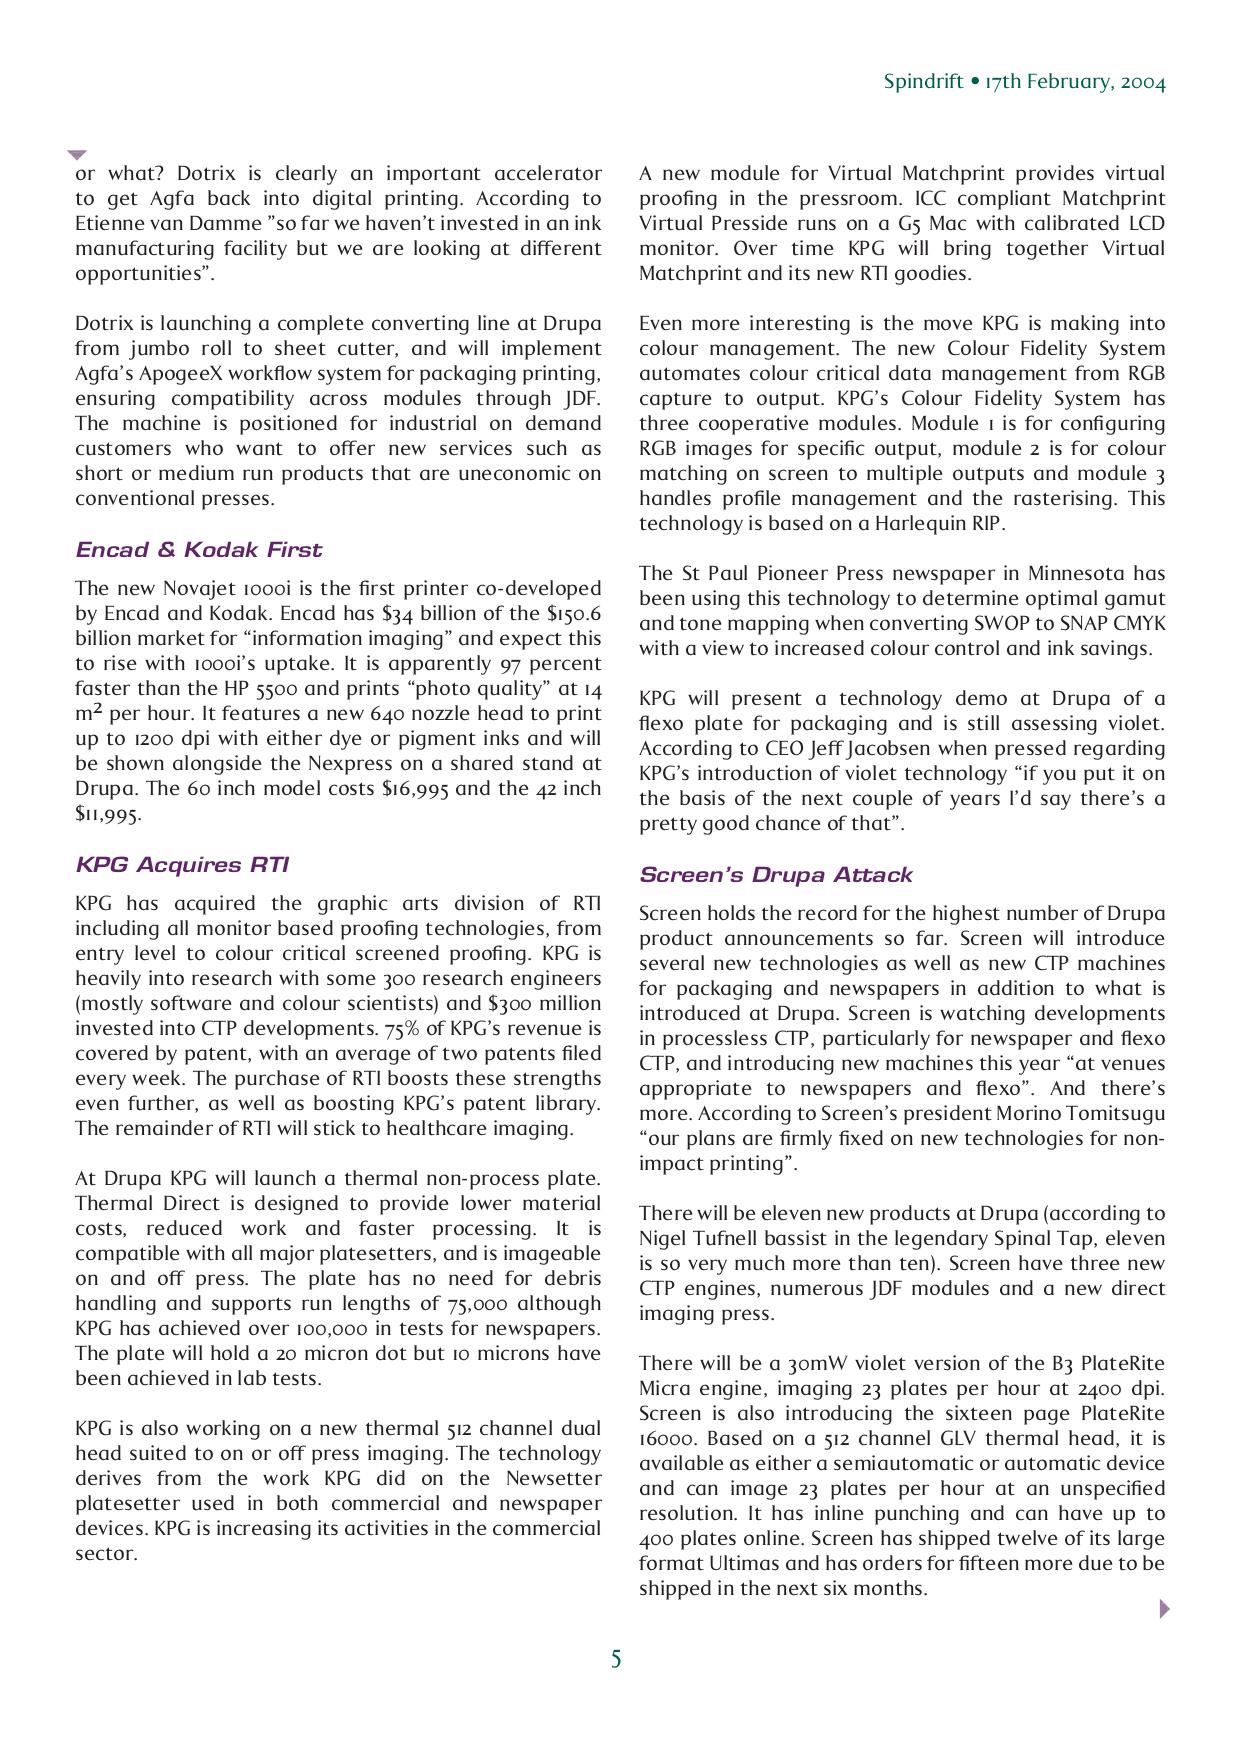 PDF manual for Xerox Printer DocuColor 6060